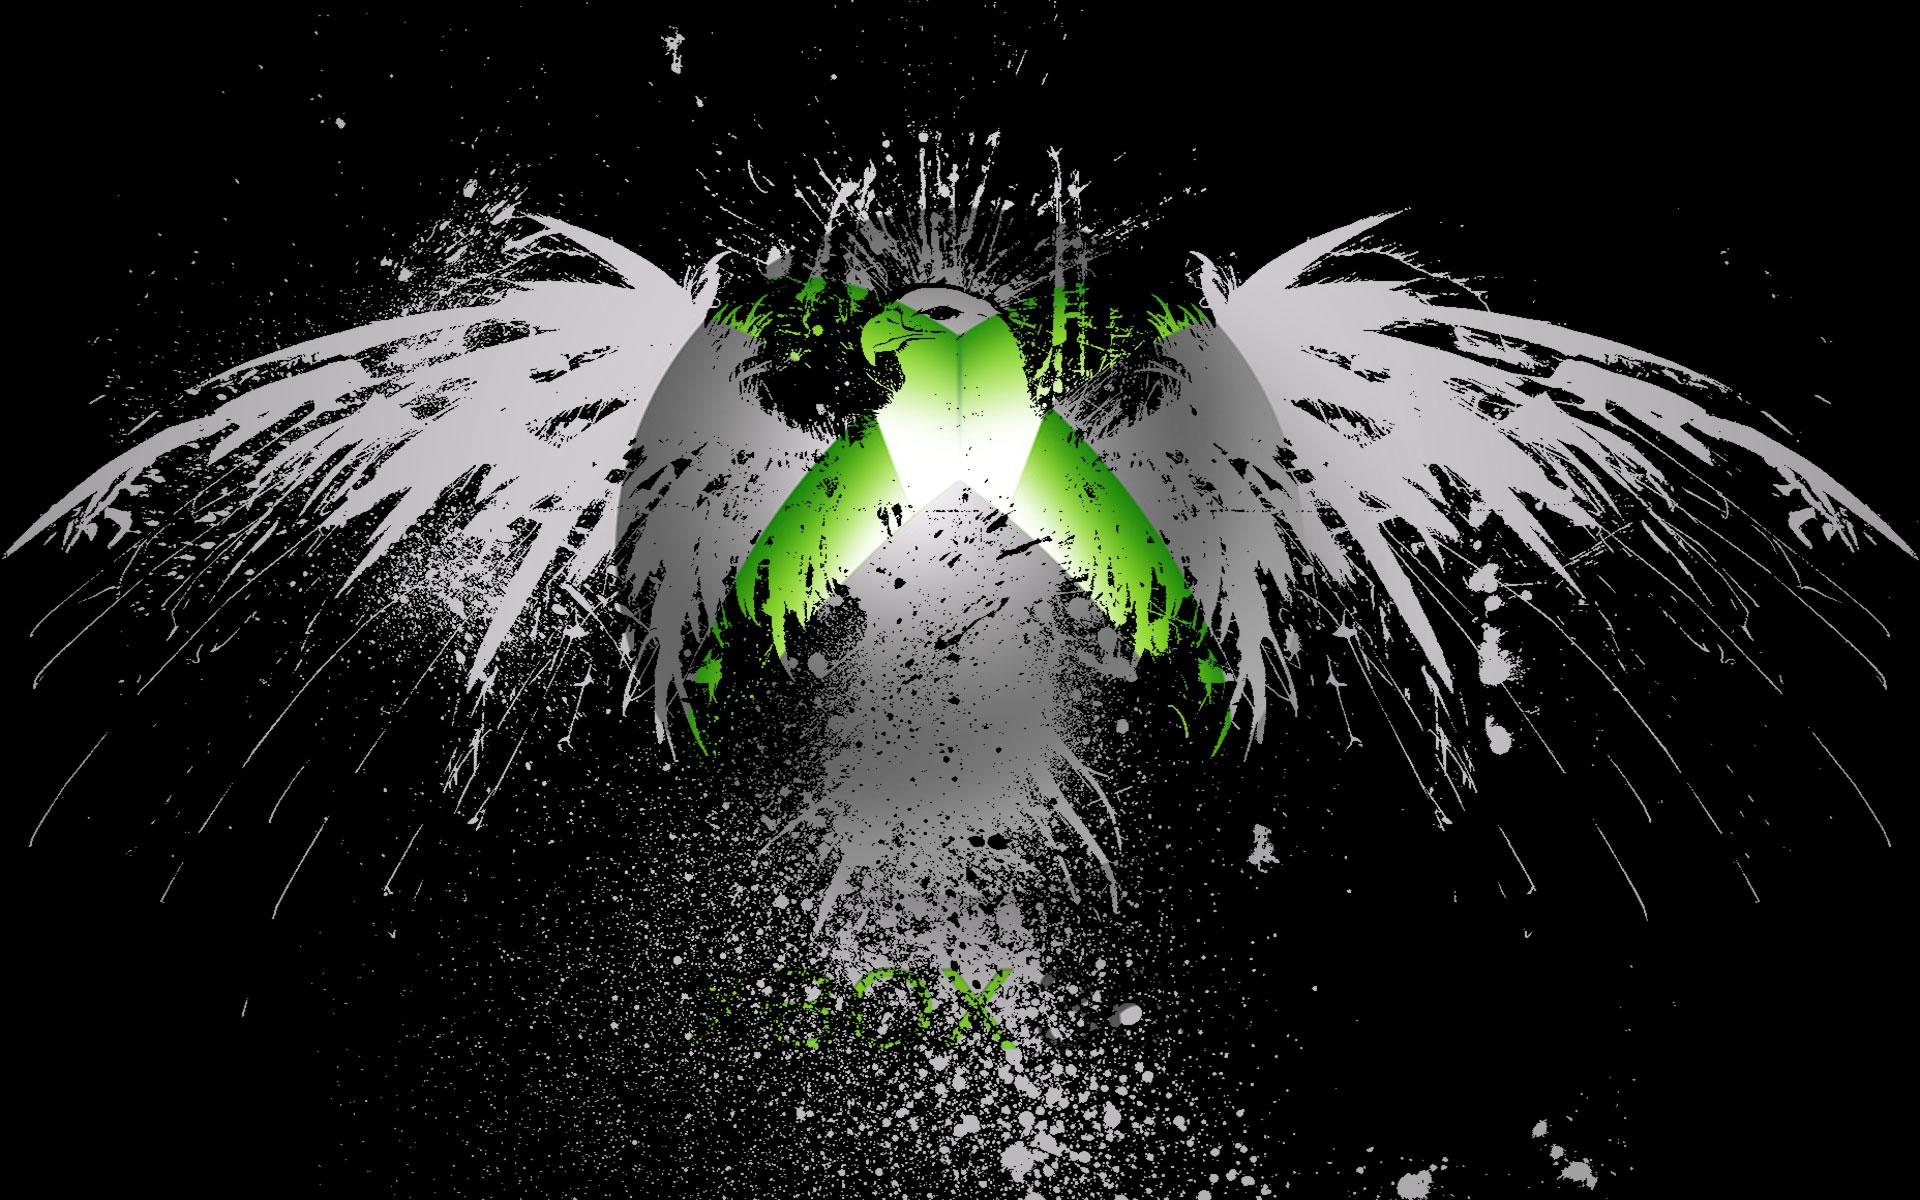 Xbox 360 Wallpaper 1920x1200